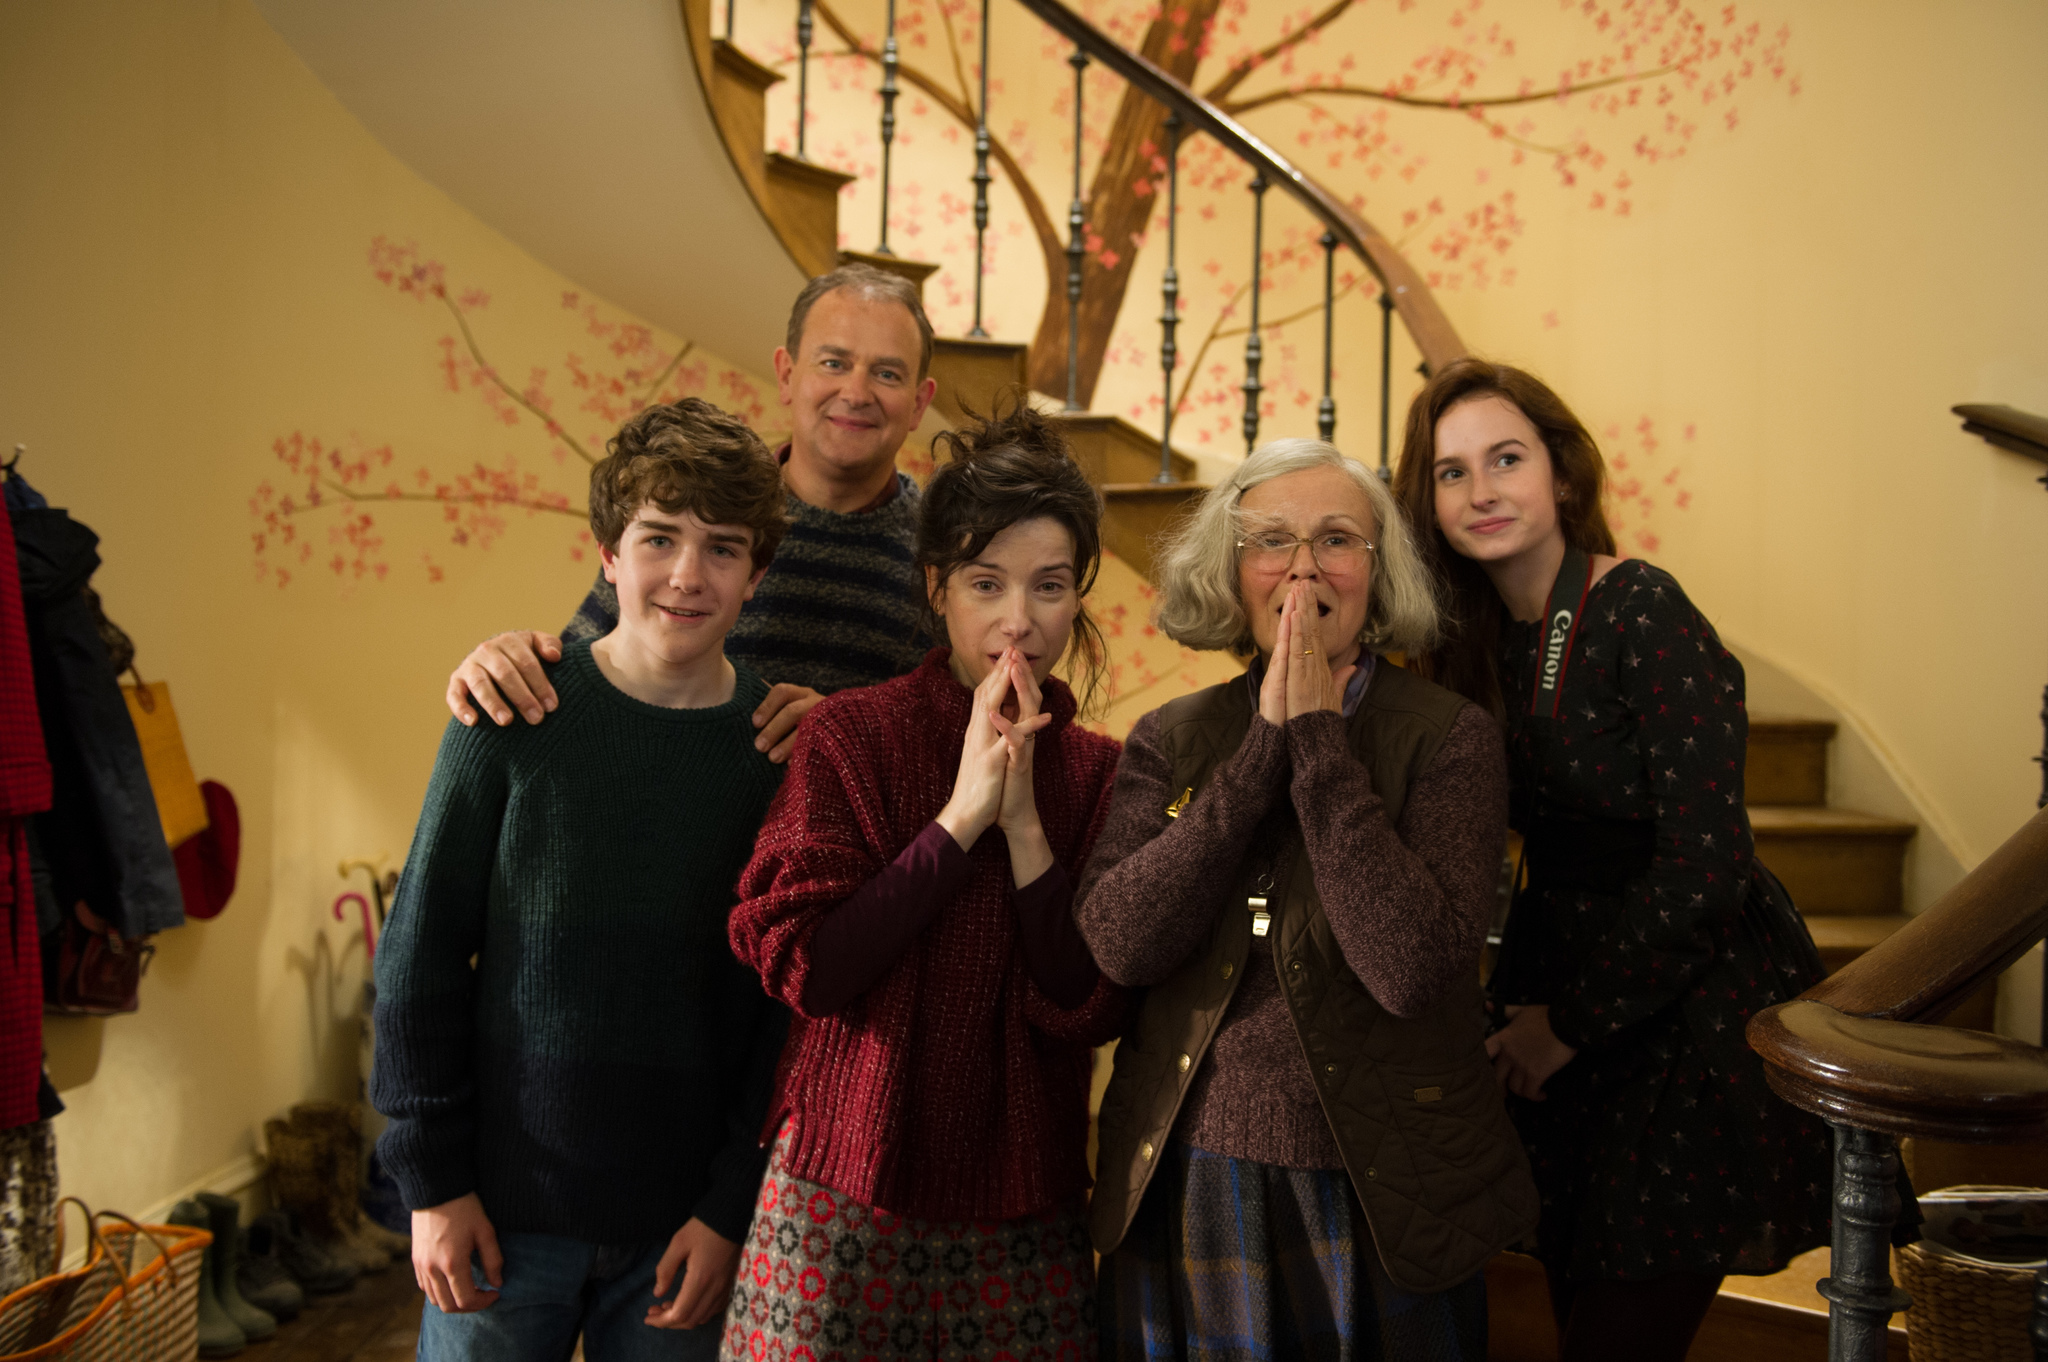 Hugh Bonneville, Julie Walters, Sally Hawkins, Madeleine Harris, and Samuel Joslin in Paddington 2 (2017)